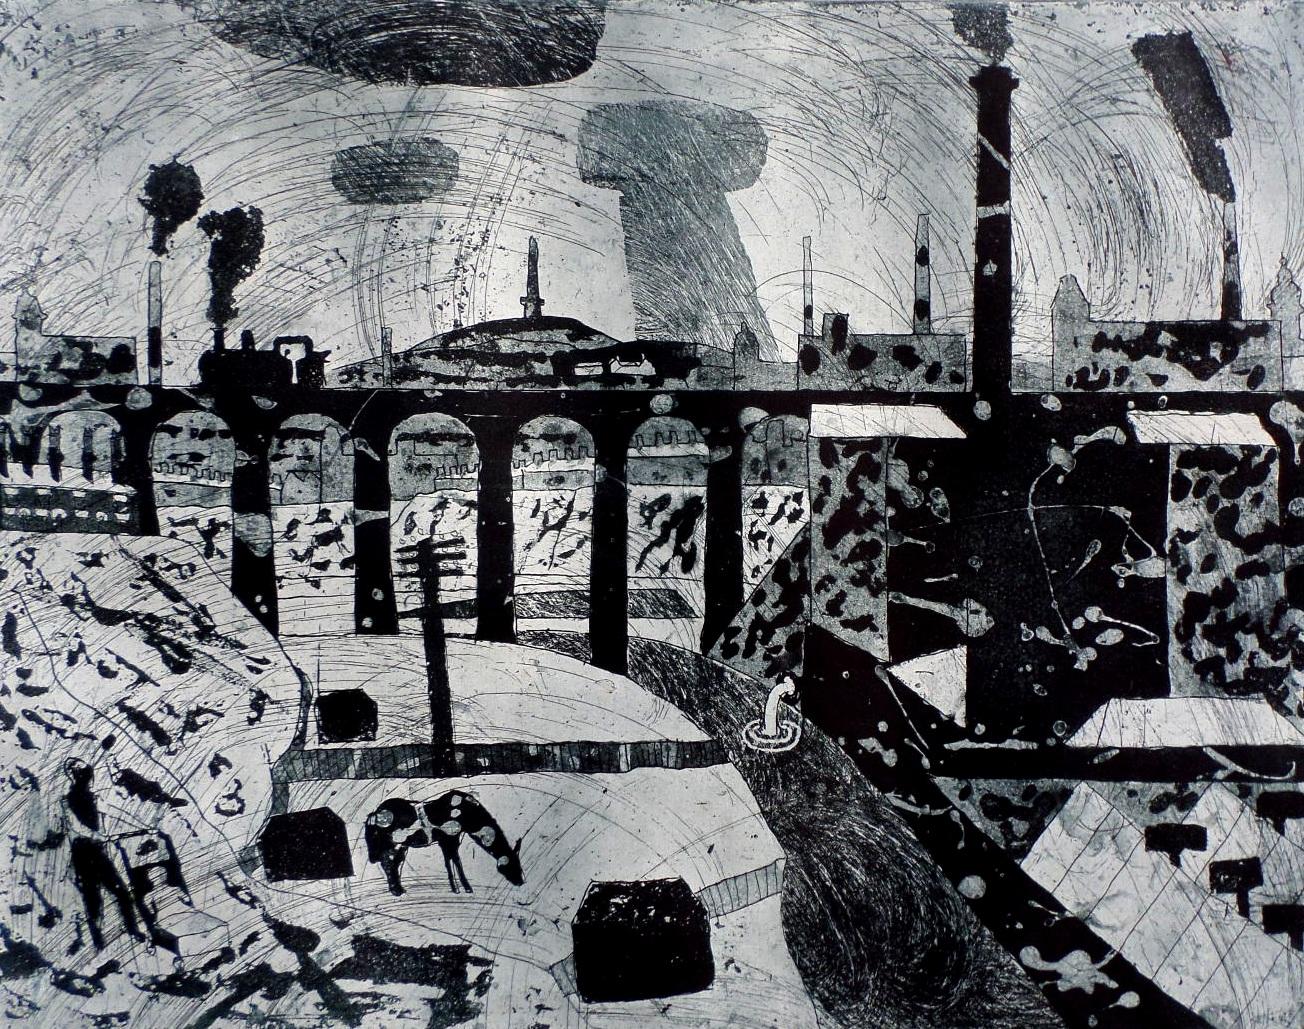 Julian Trevelyan Bolton etching for sale